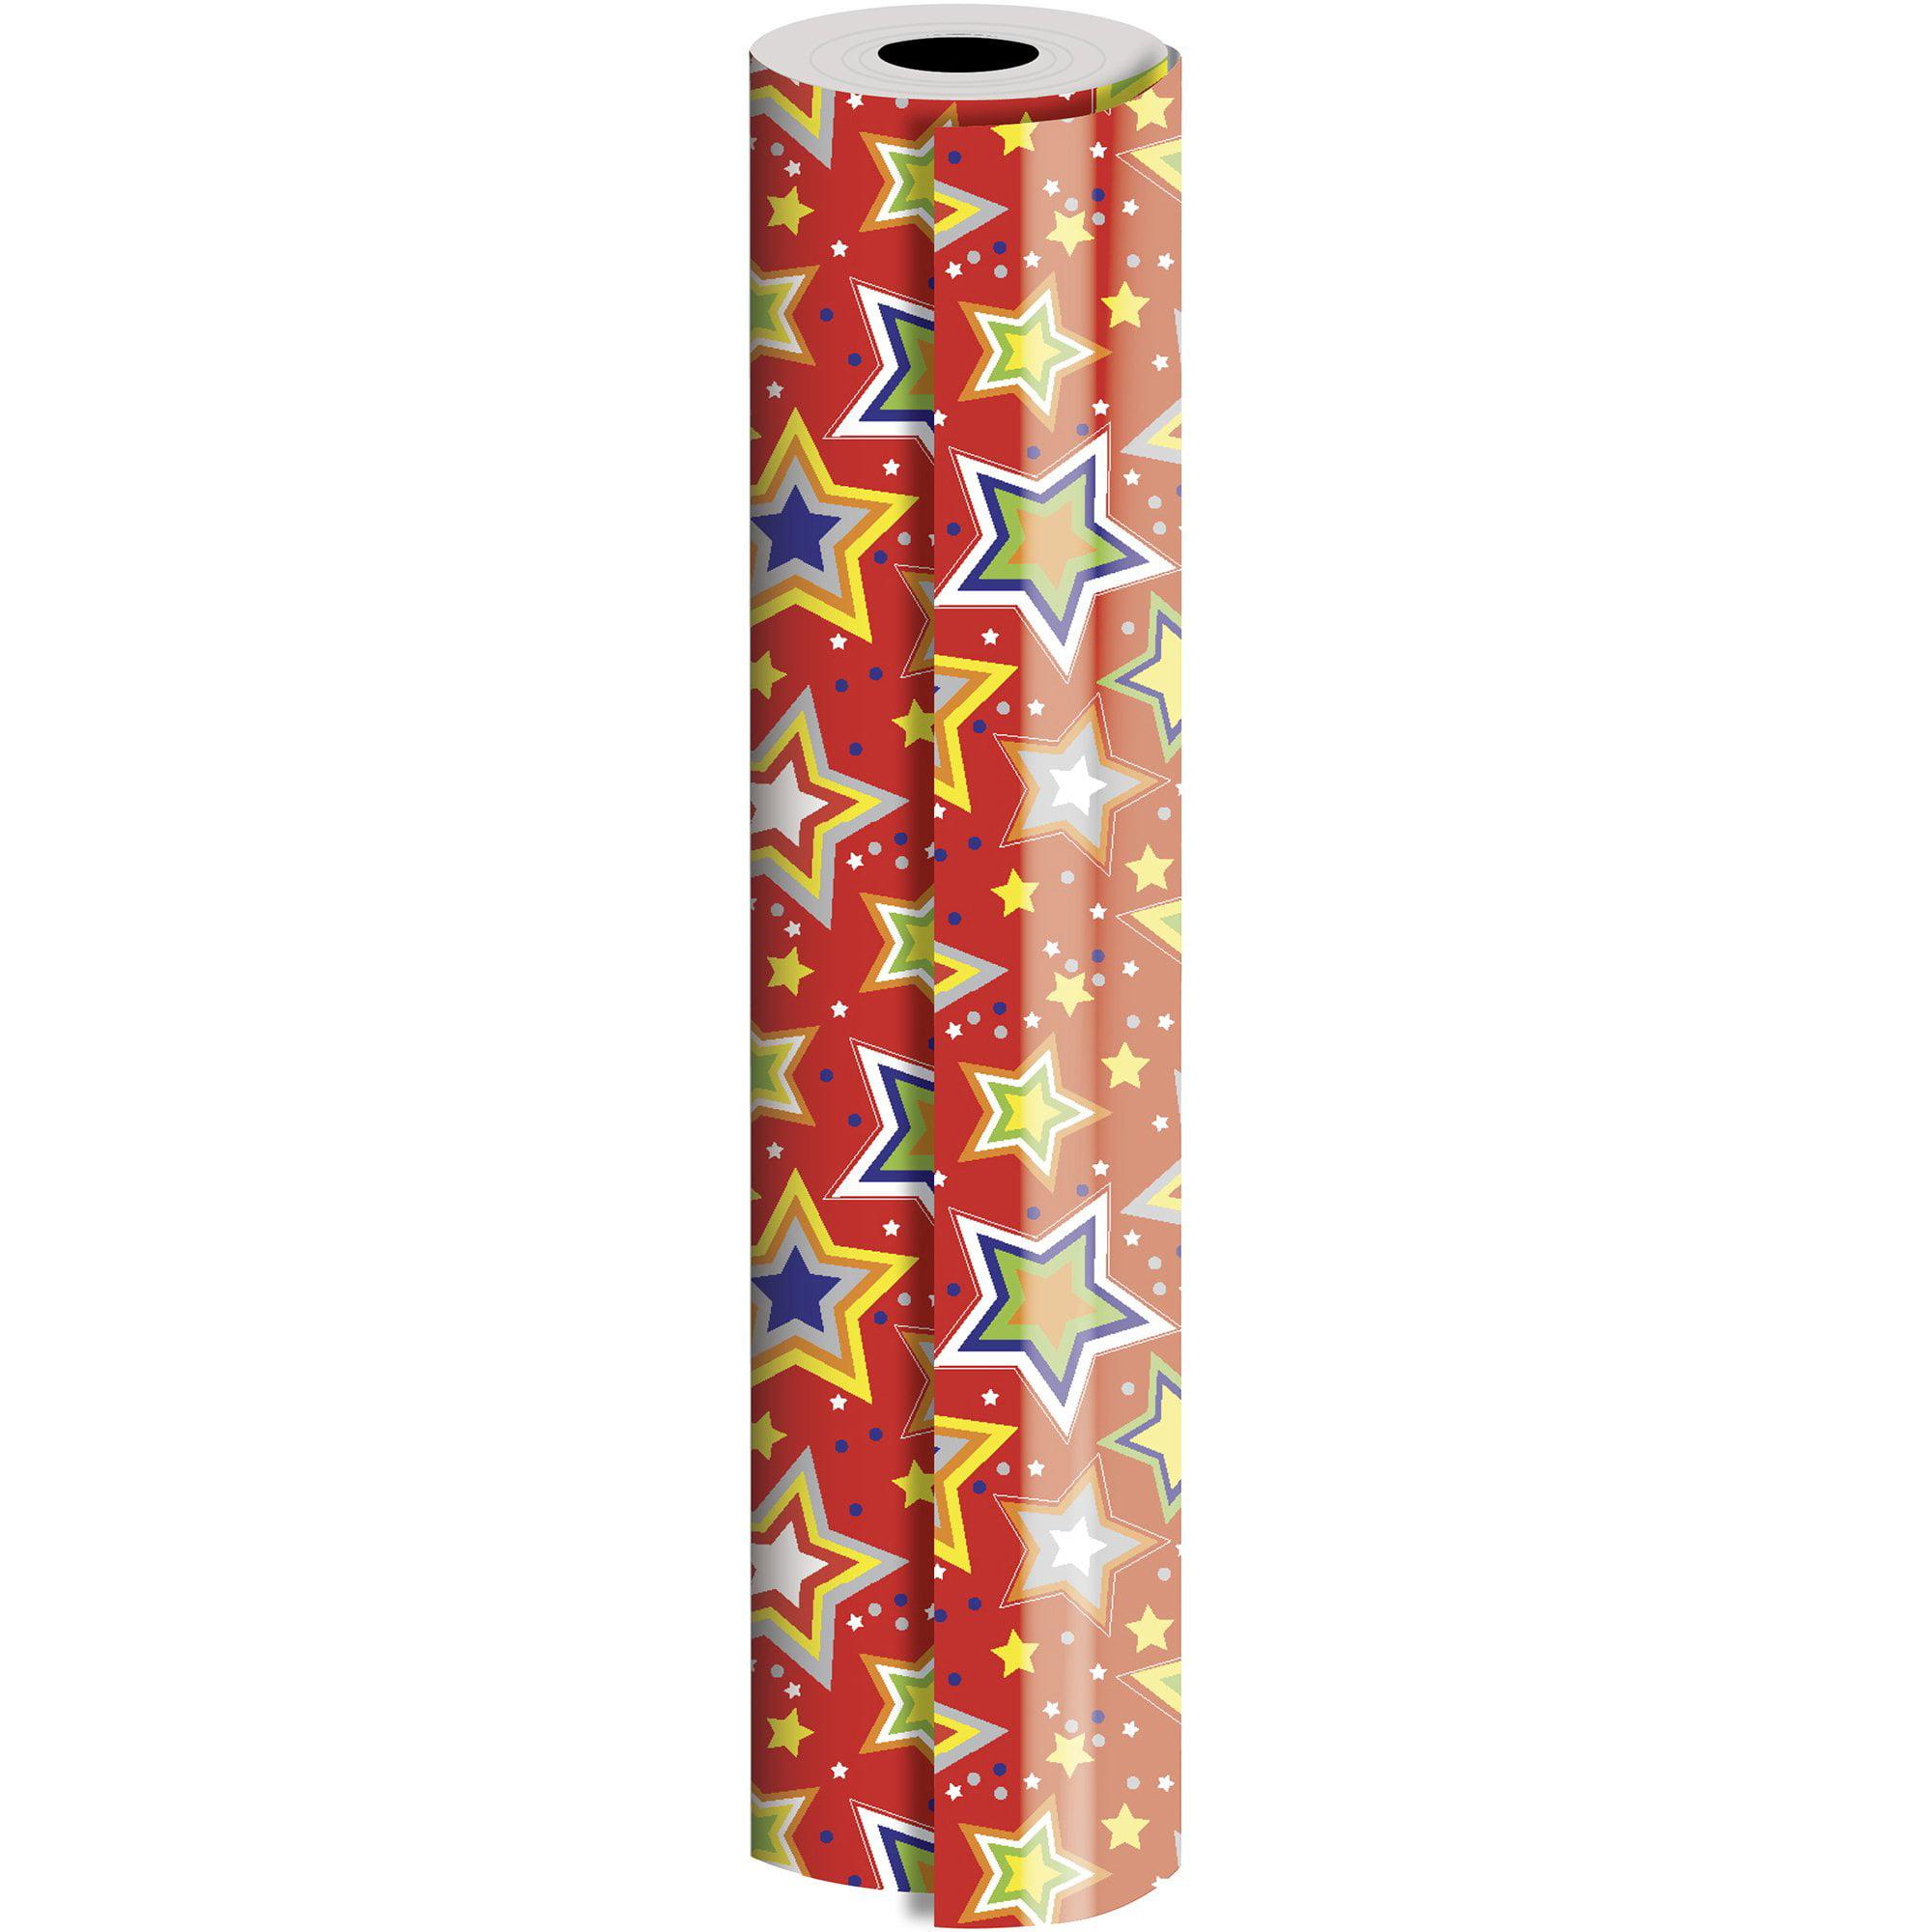 "Jillson & Roberts Bulk Gift Wrap, Starry Red, 1/2 Ream 417' x 24"""